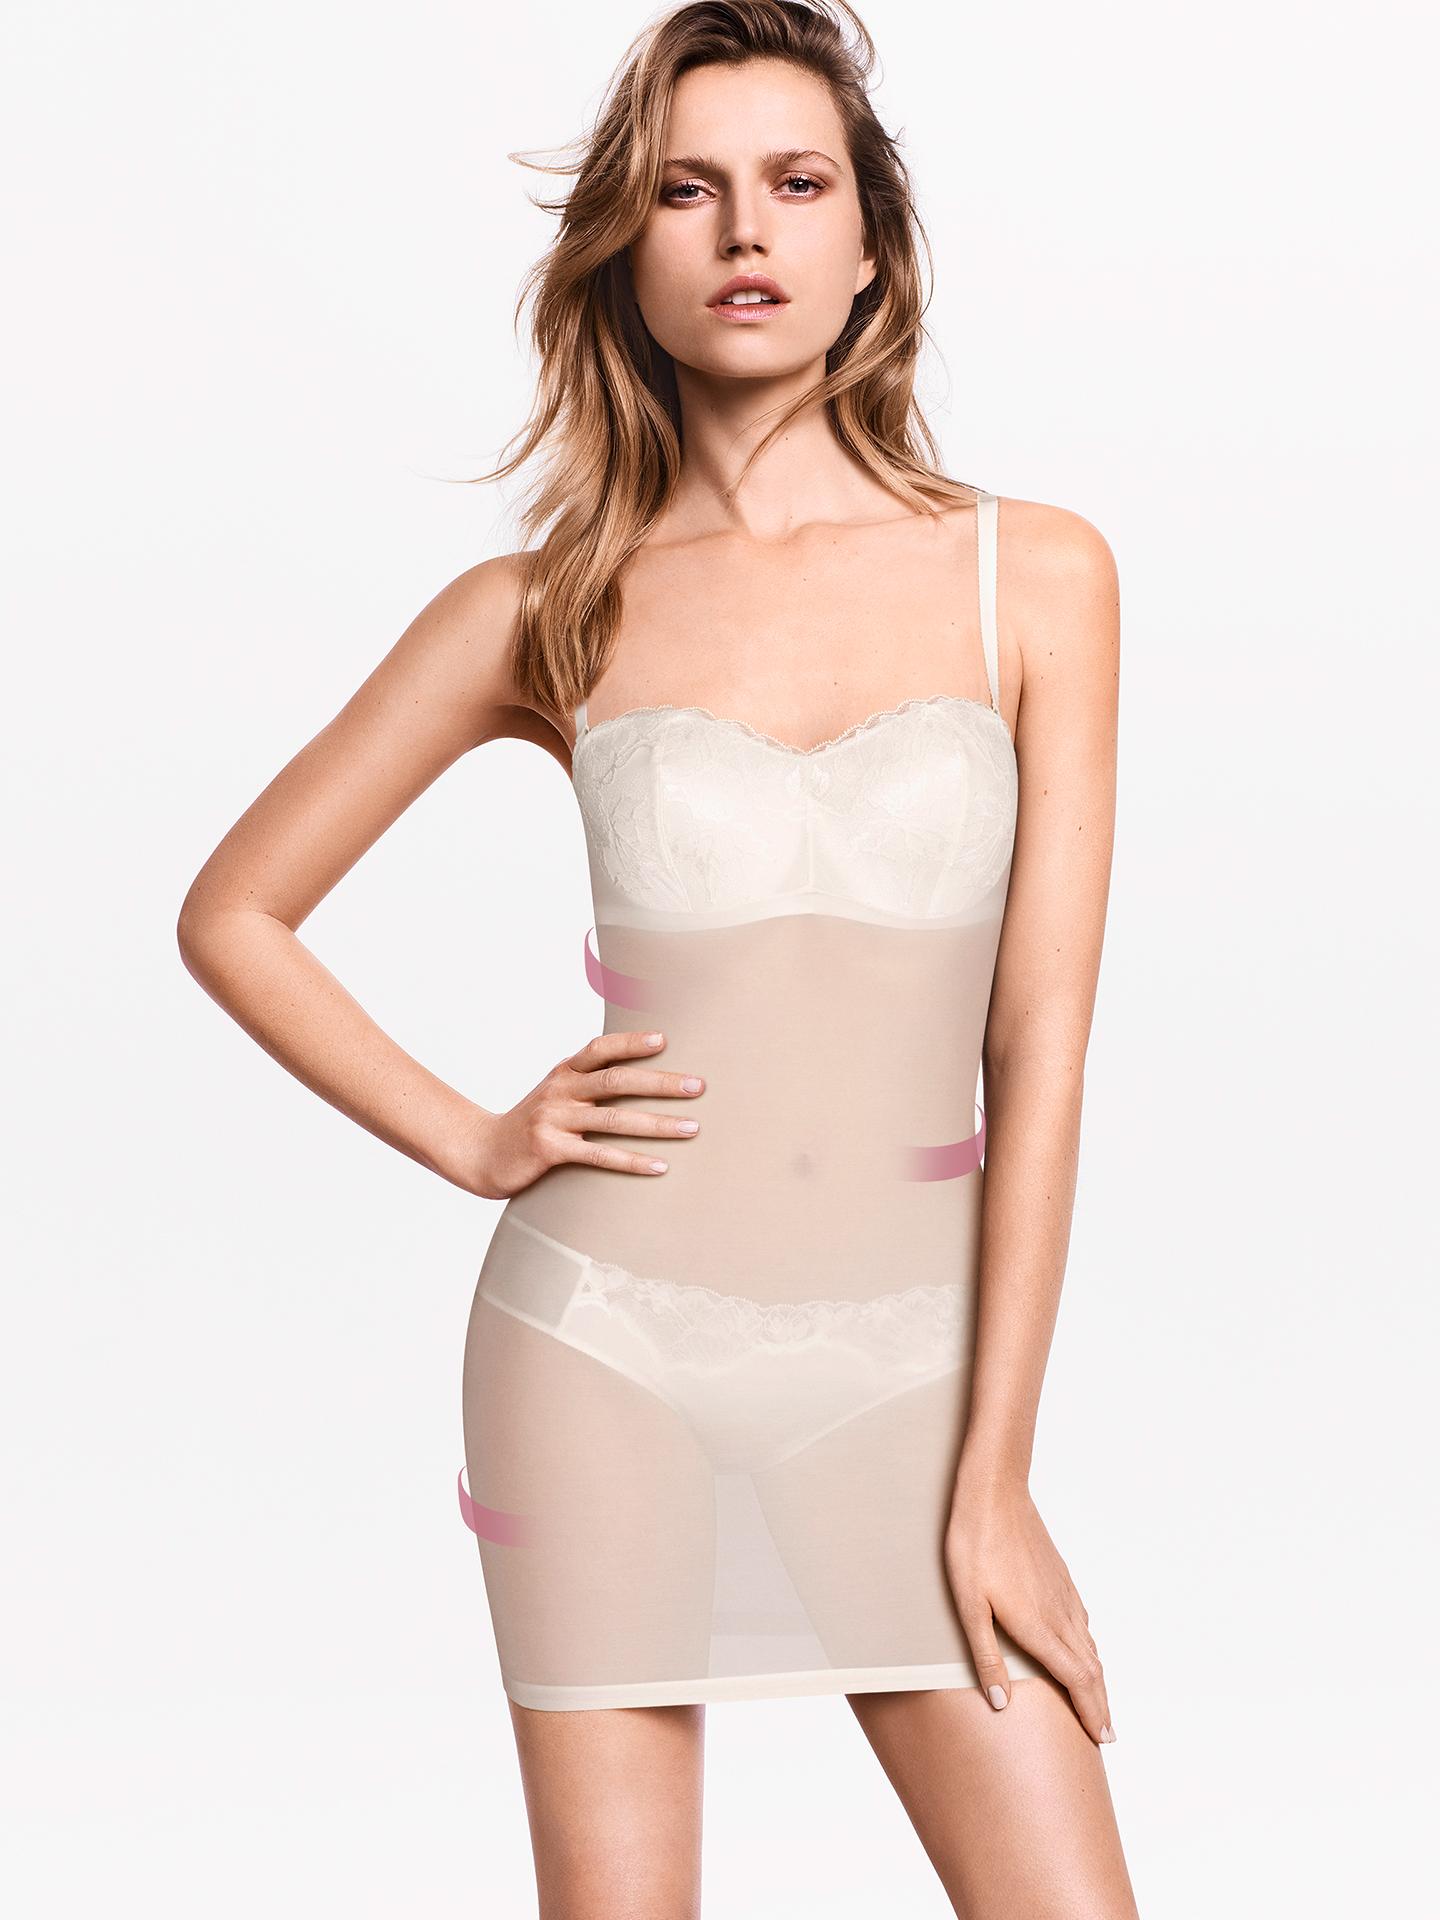 Eve Forming Dress - 1147 - 36B